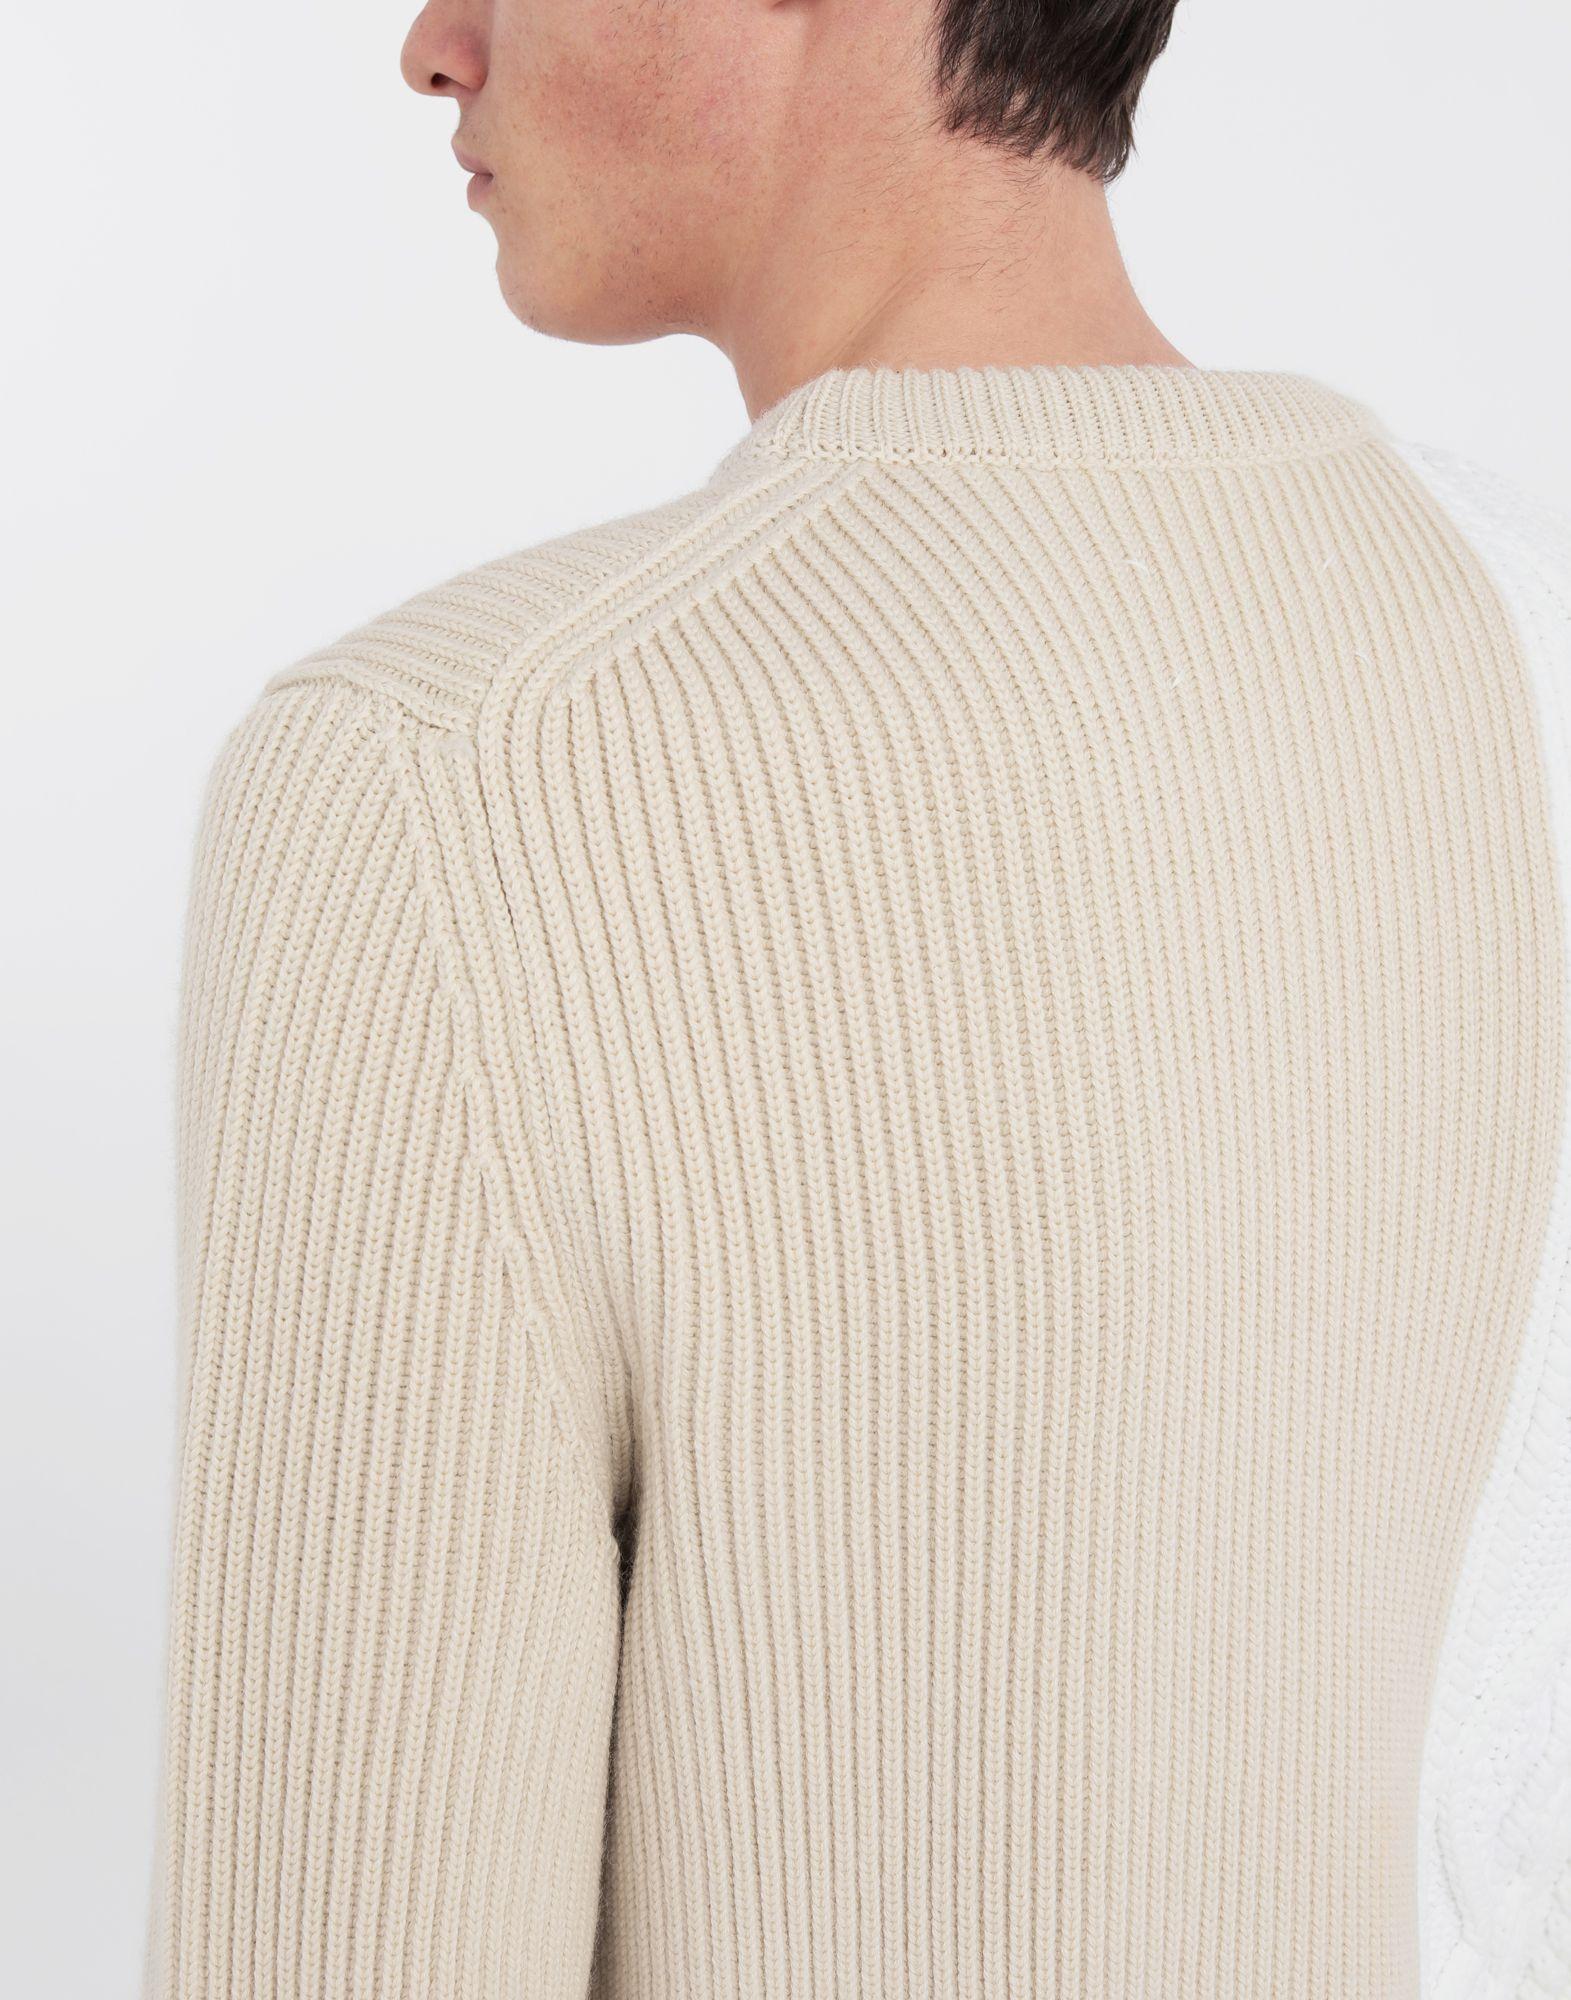 MAISON MARGIELA Spliced knit pullover Crewneck sweater Man b